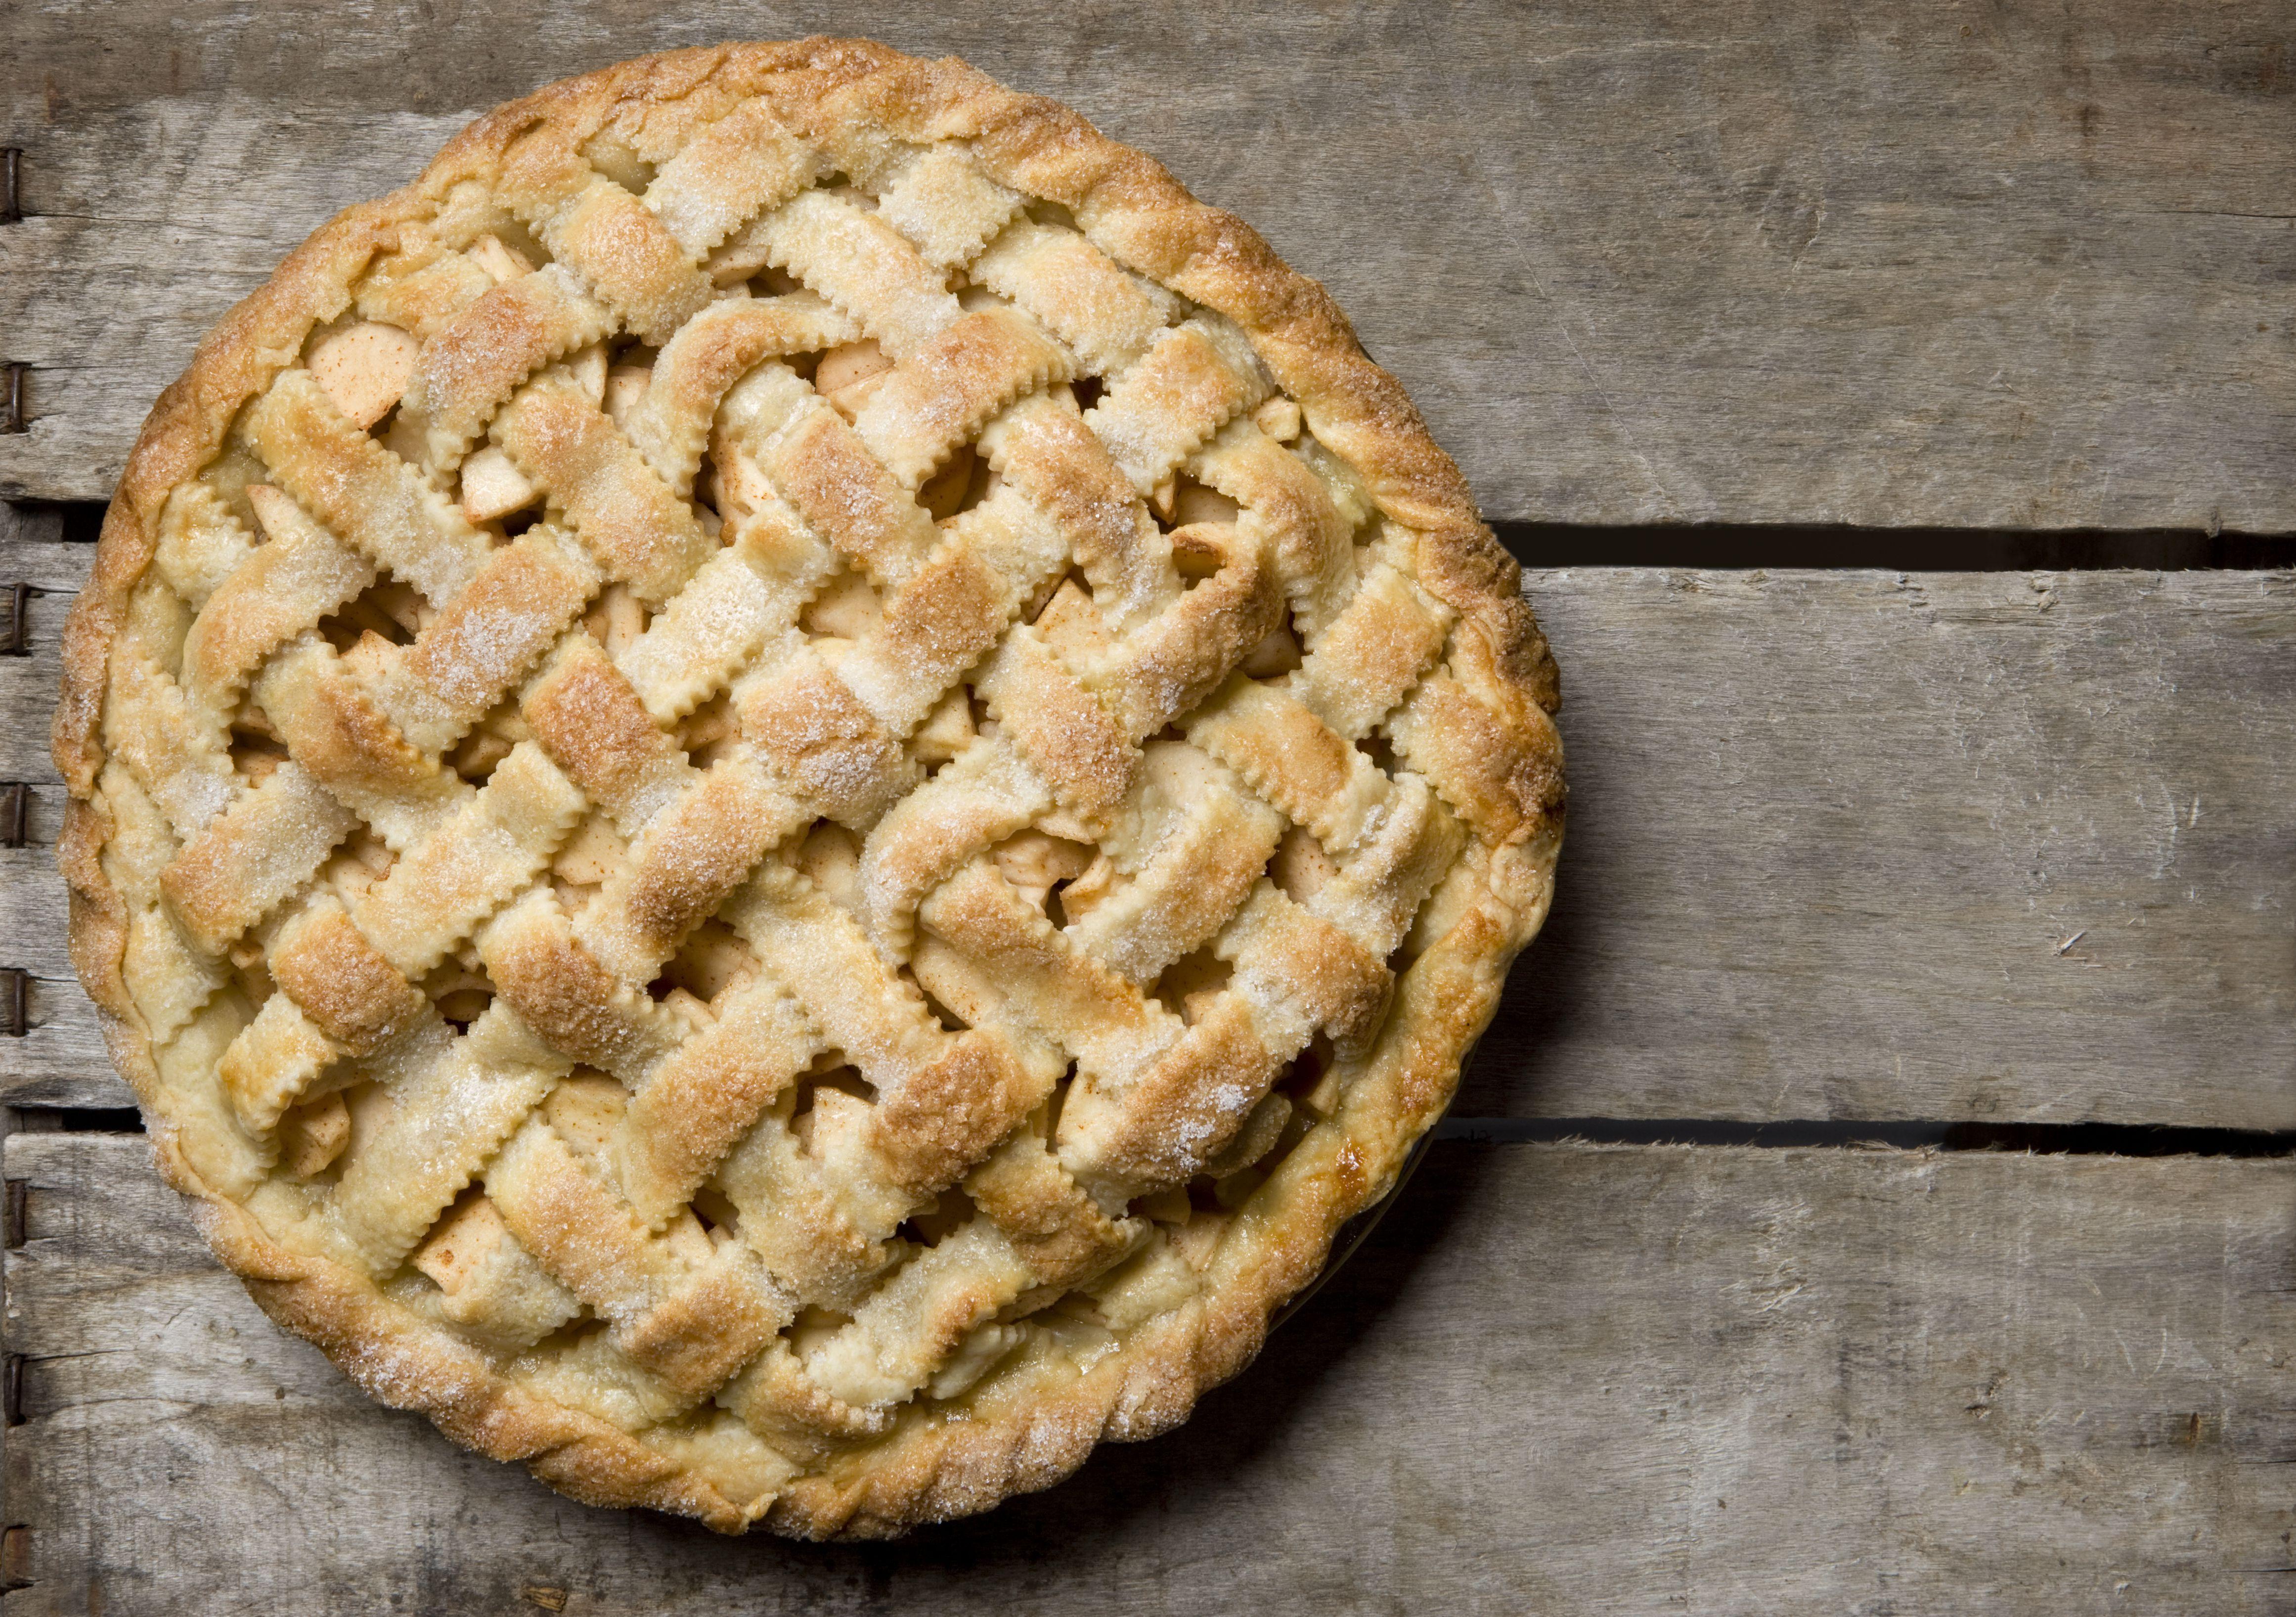 Homemade apple pie with lattice crust